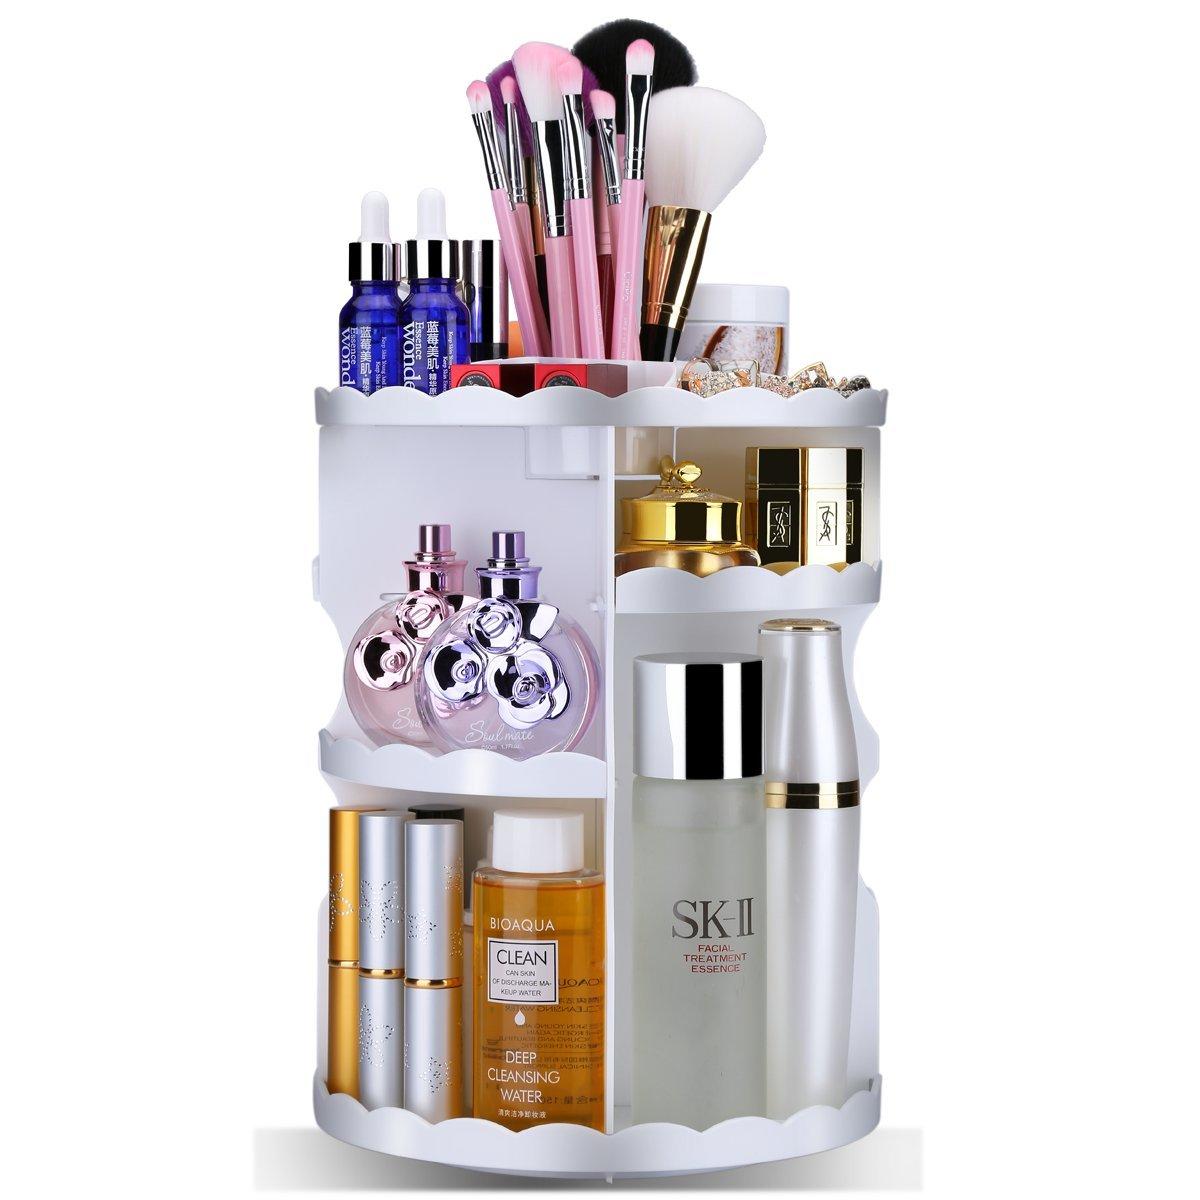 EMOCCI Makeup Organiser (Spitze Seite)